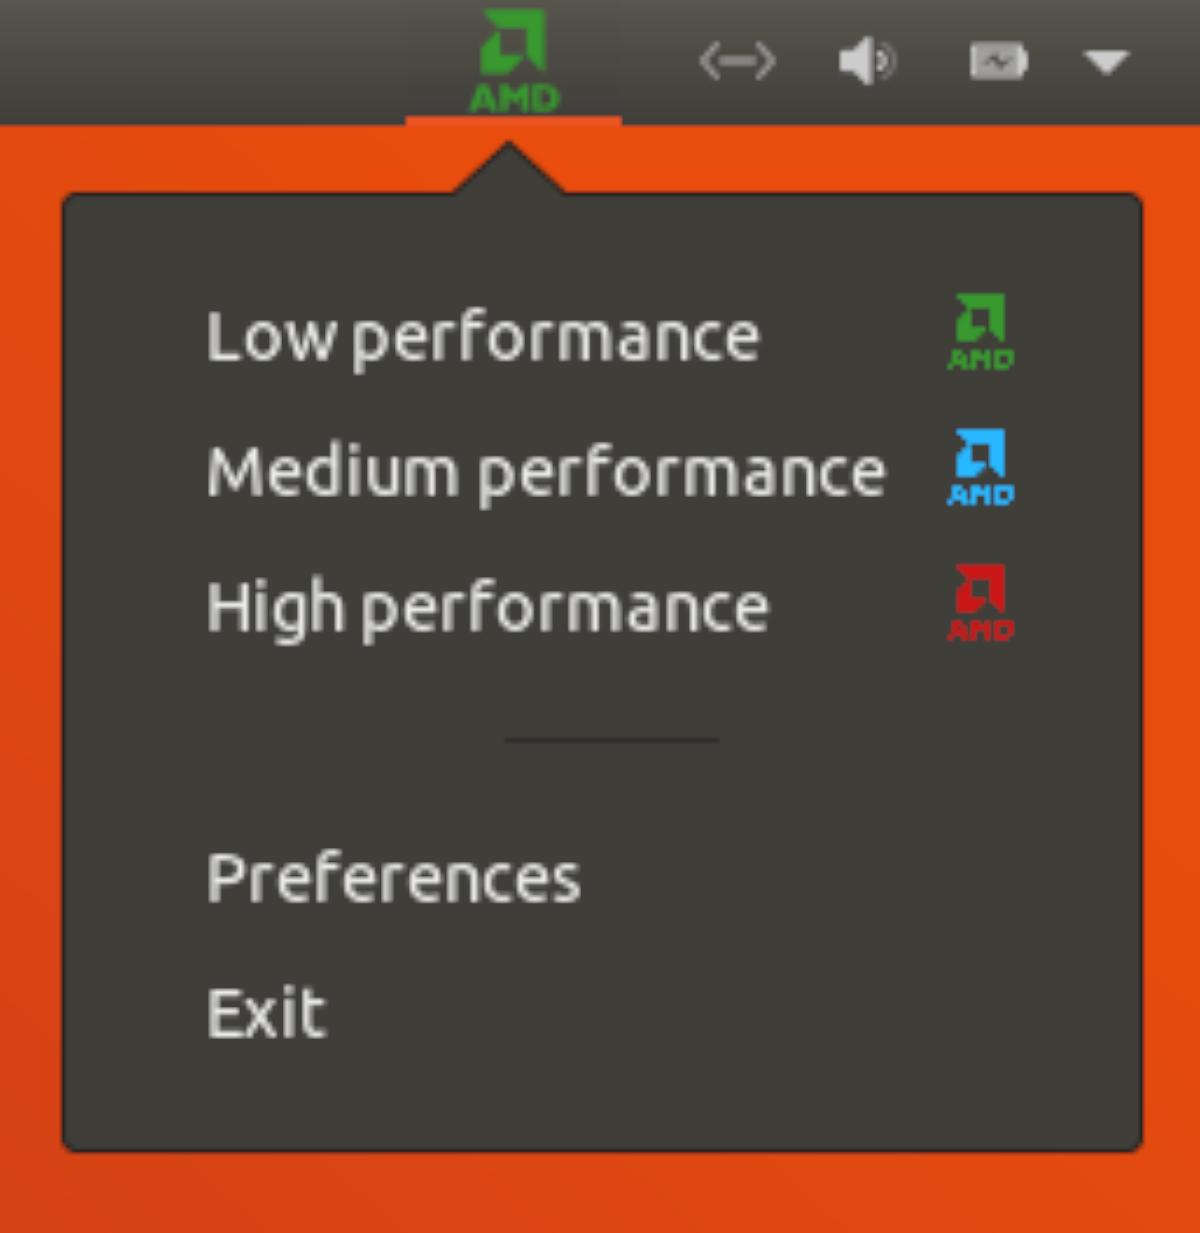 how to use the slimbook mobile ryzen cpu tuner on ubuntu 1 How to interworking extant Slimbook uncompliant Ryzen ALU tuner on Ubuntu